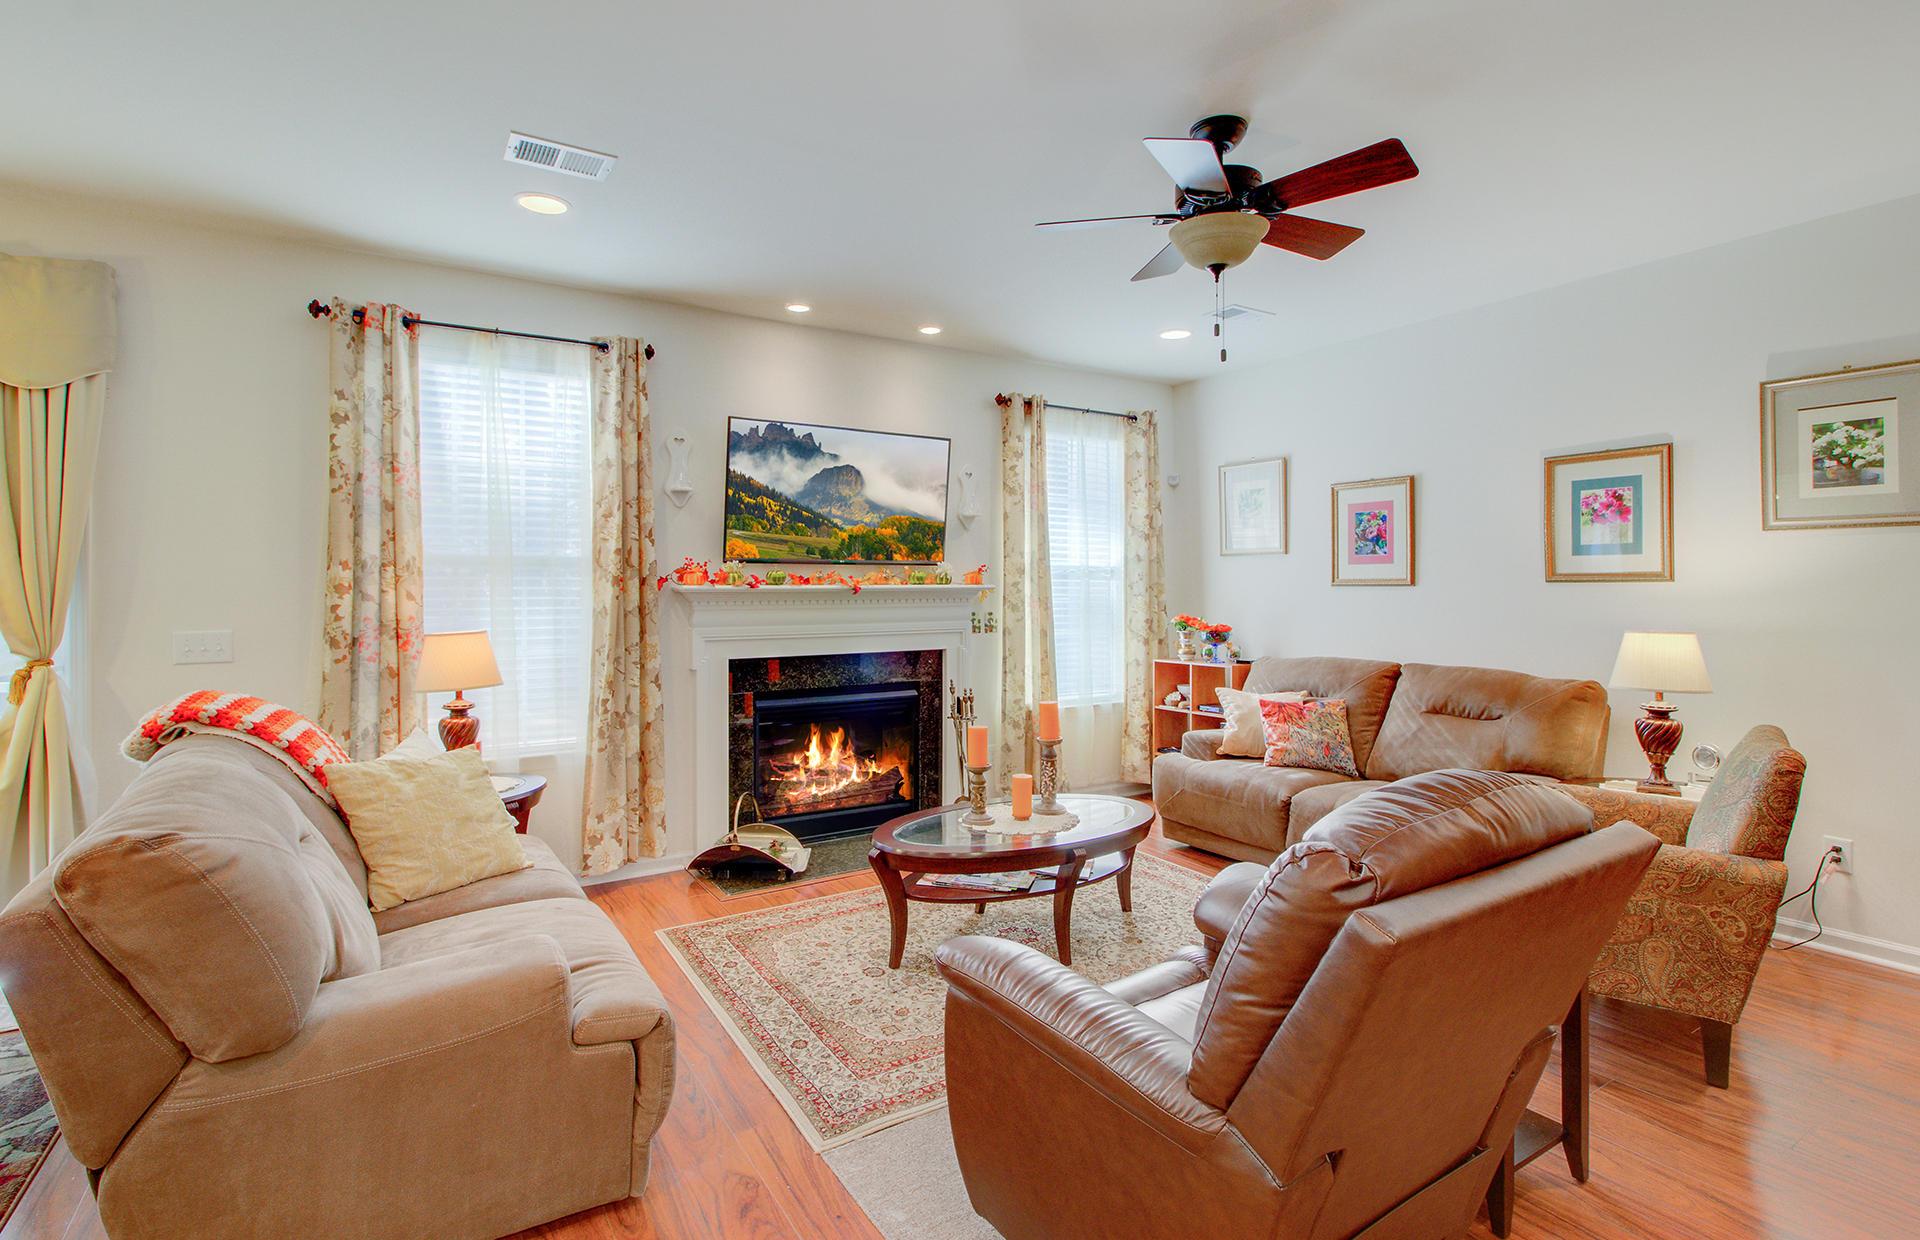 Cane Bay Plantation Homes For Sale - 255 Spectrum, Summerville, SC - 6